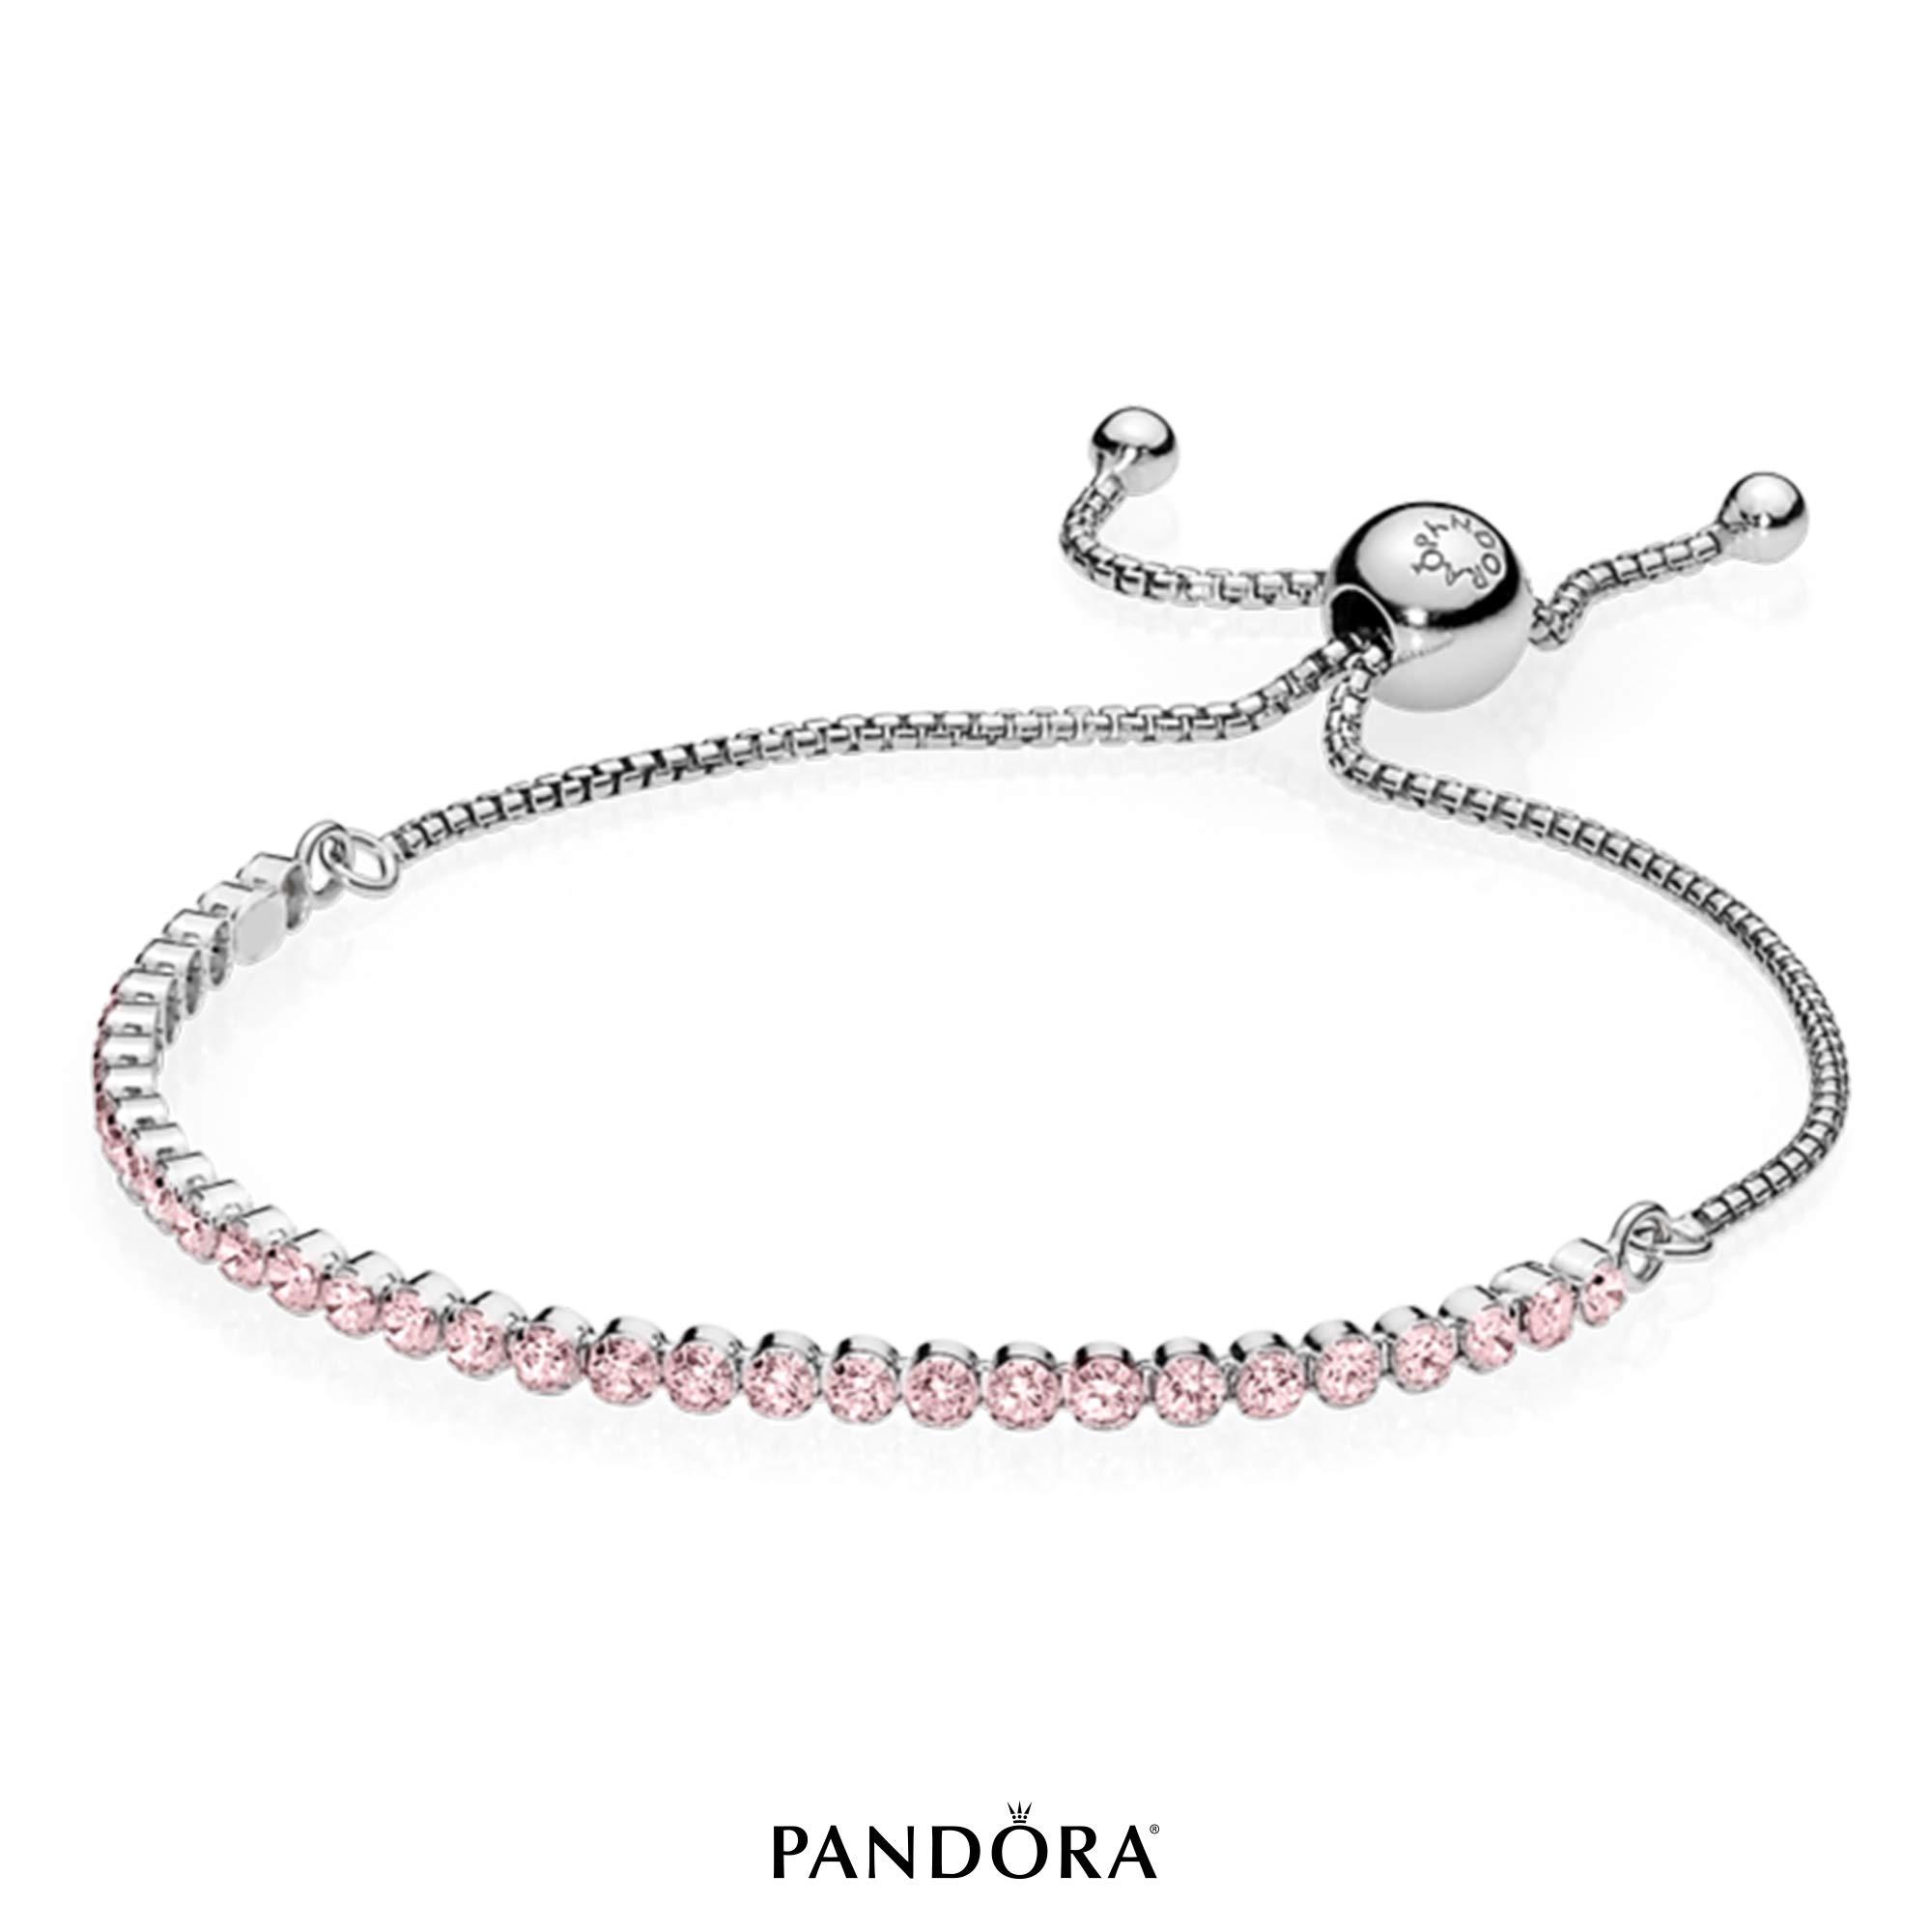 PANDORA Sparkling Strand Bracelet, Sterling Silver, Pink Cubic Zirconia, 9.9 in by PANDORA